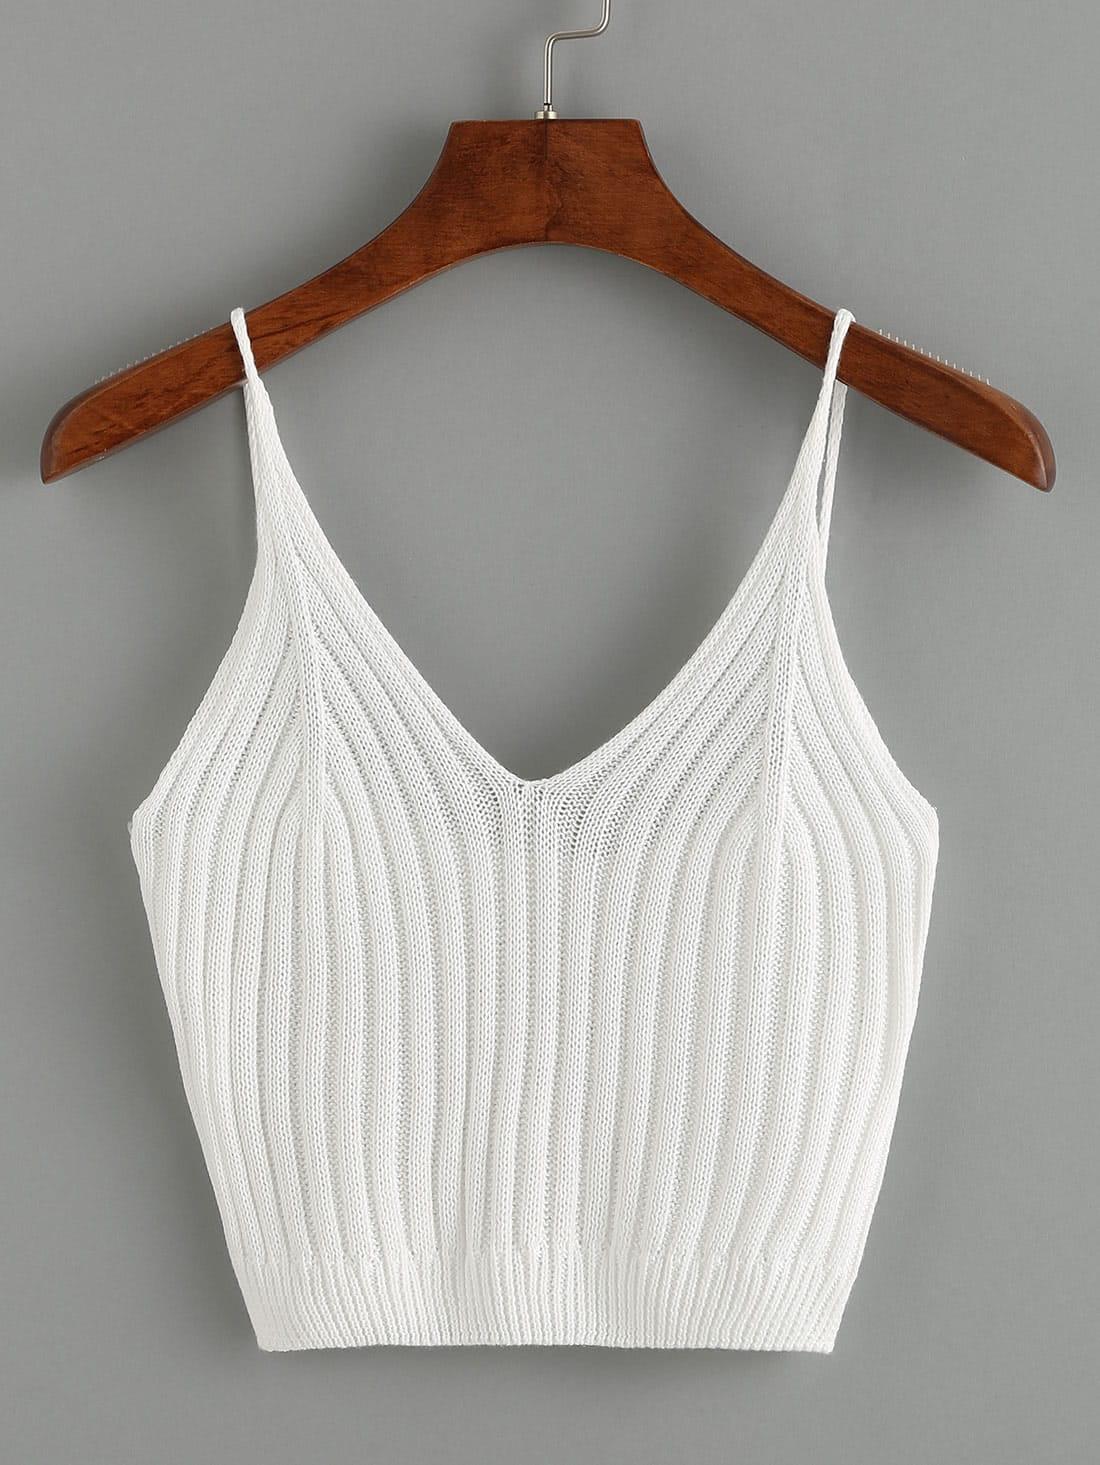 Ribbed Knit Crop Cami Top vest160603008